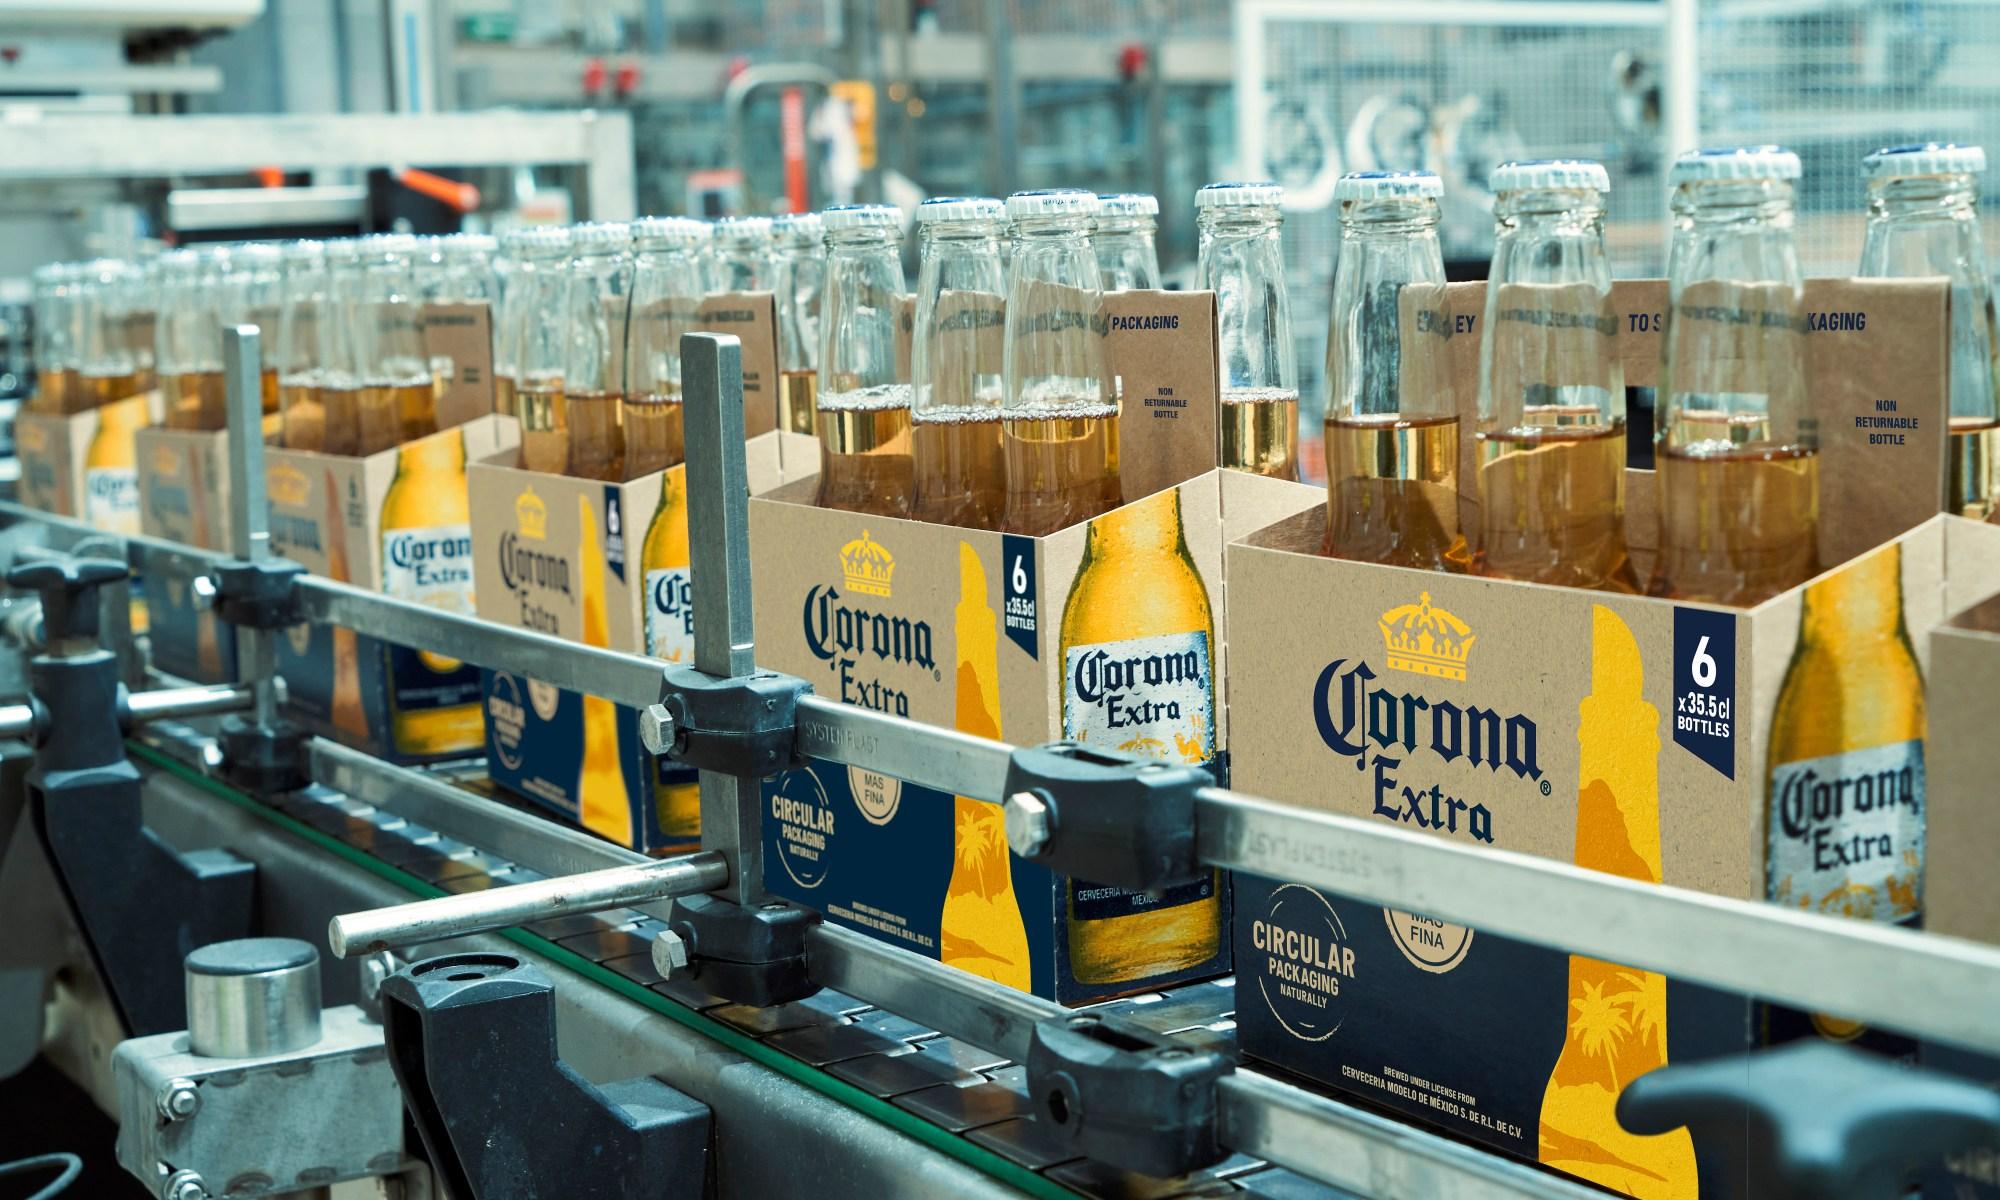 corona barley packaging